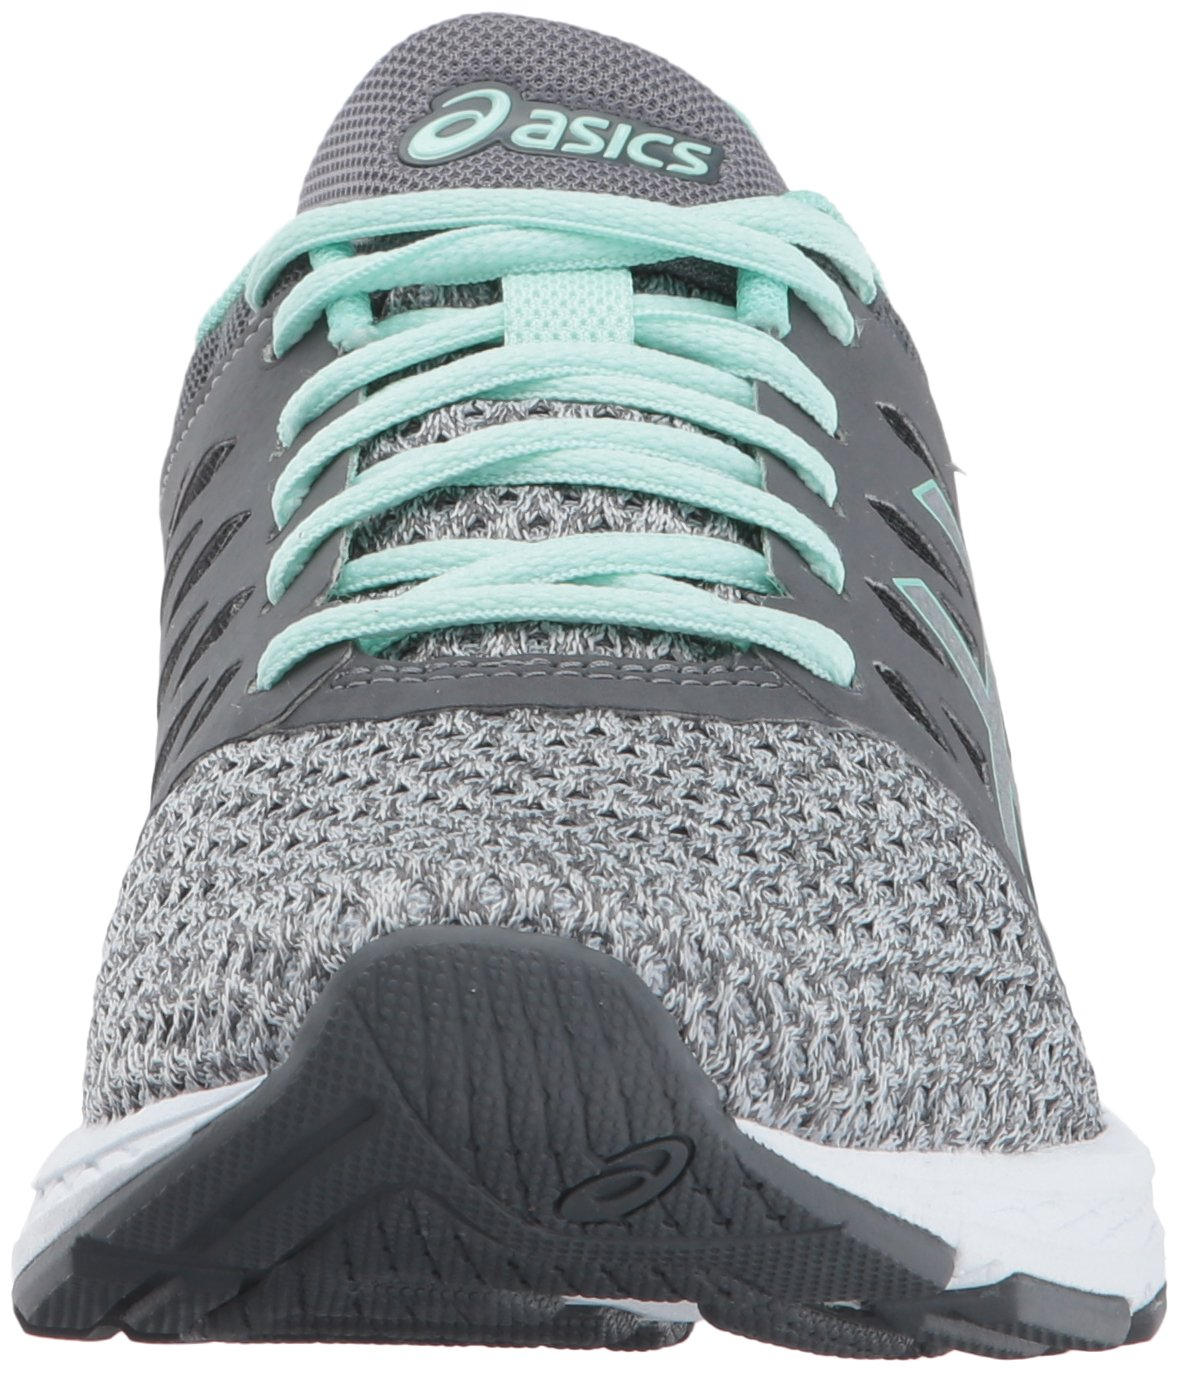 ASICS Women's Gel-Exalt 4 Running Shoe B01N8P5NNT 10 M US|Mid Grey/Silver/Glacier Sea